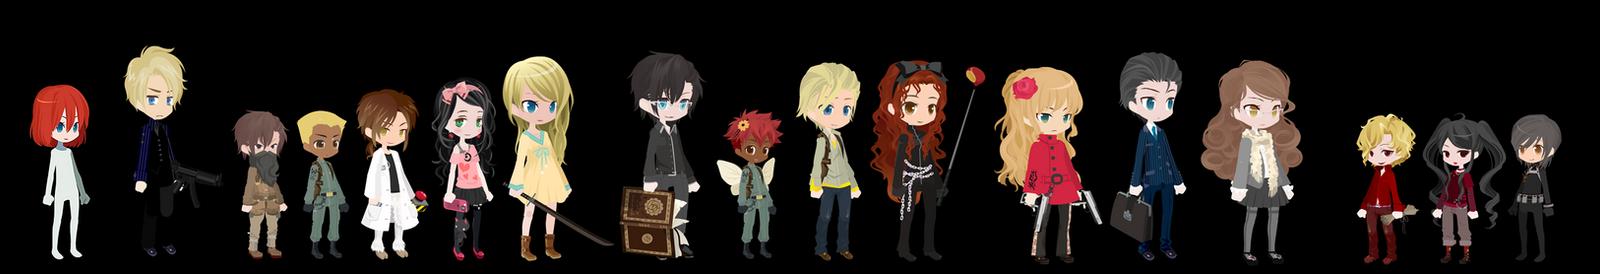 The Viper Main Characters by RenegadeGenius